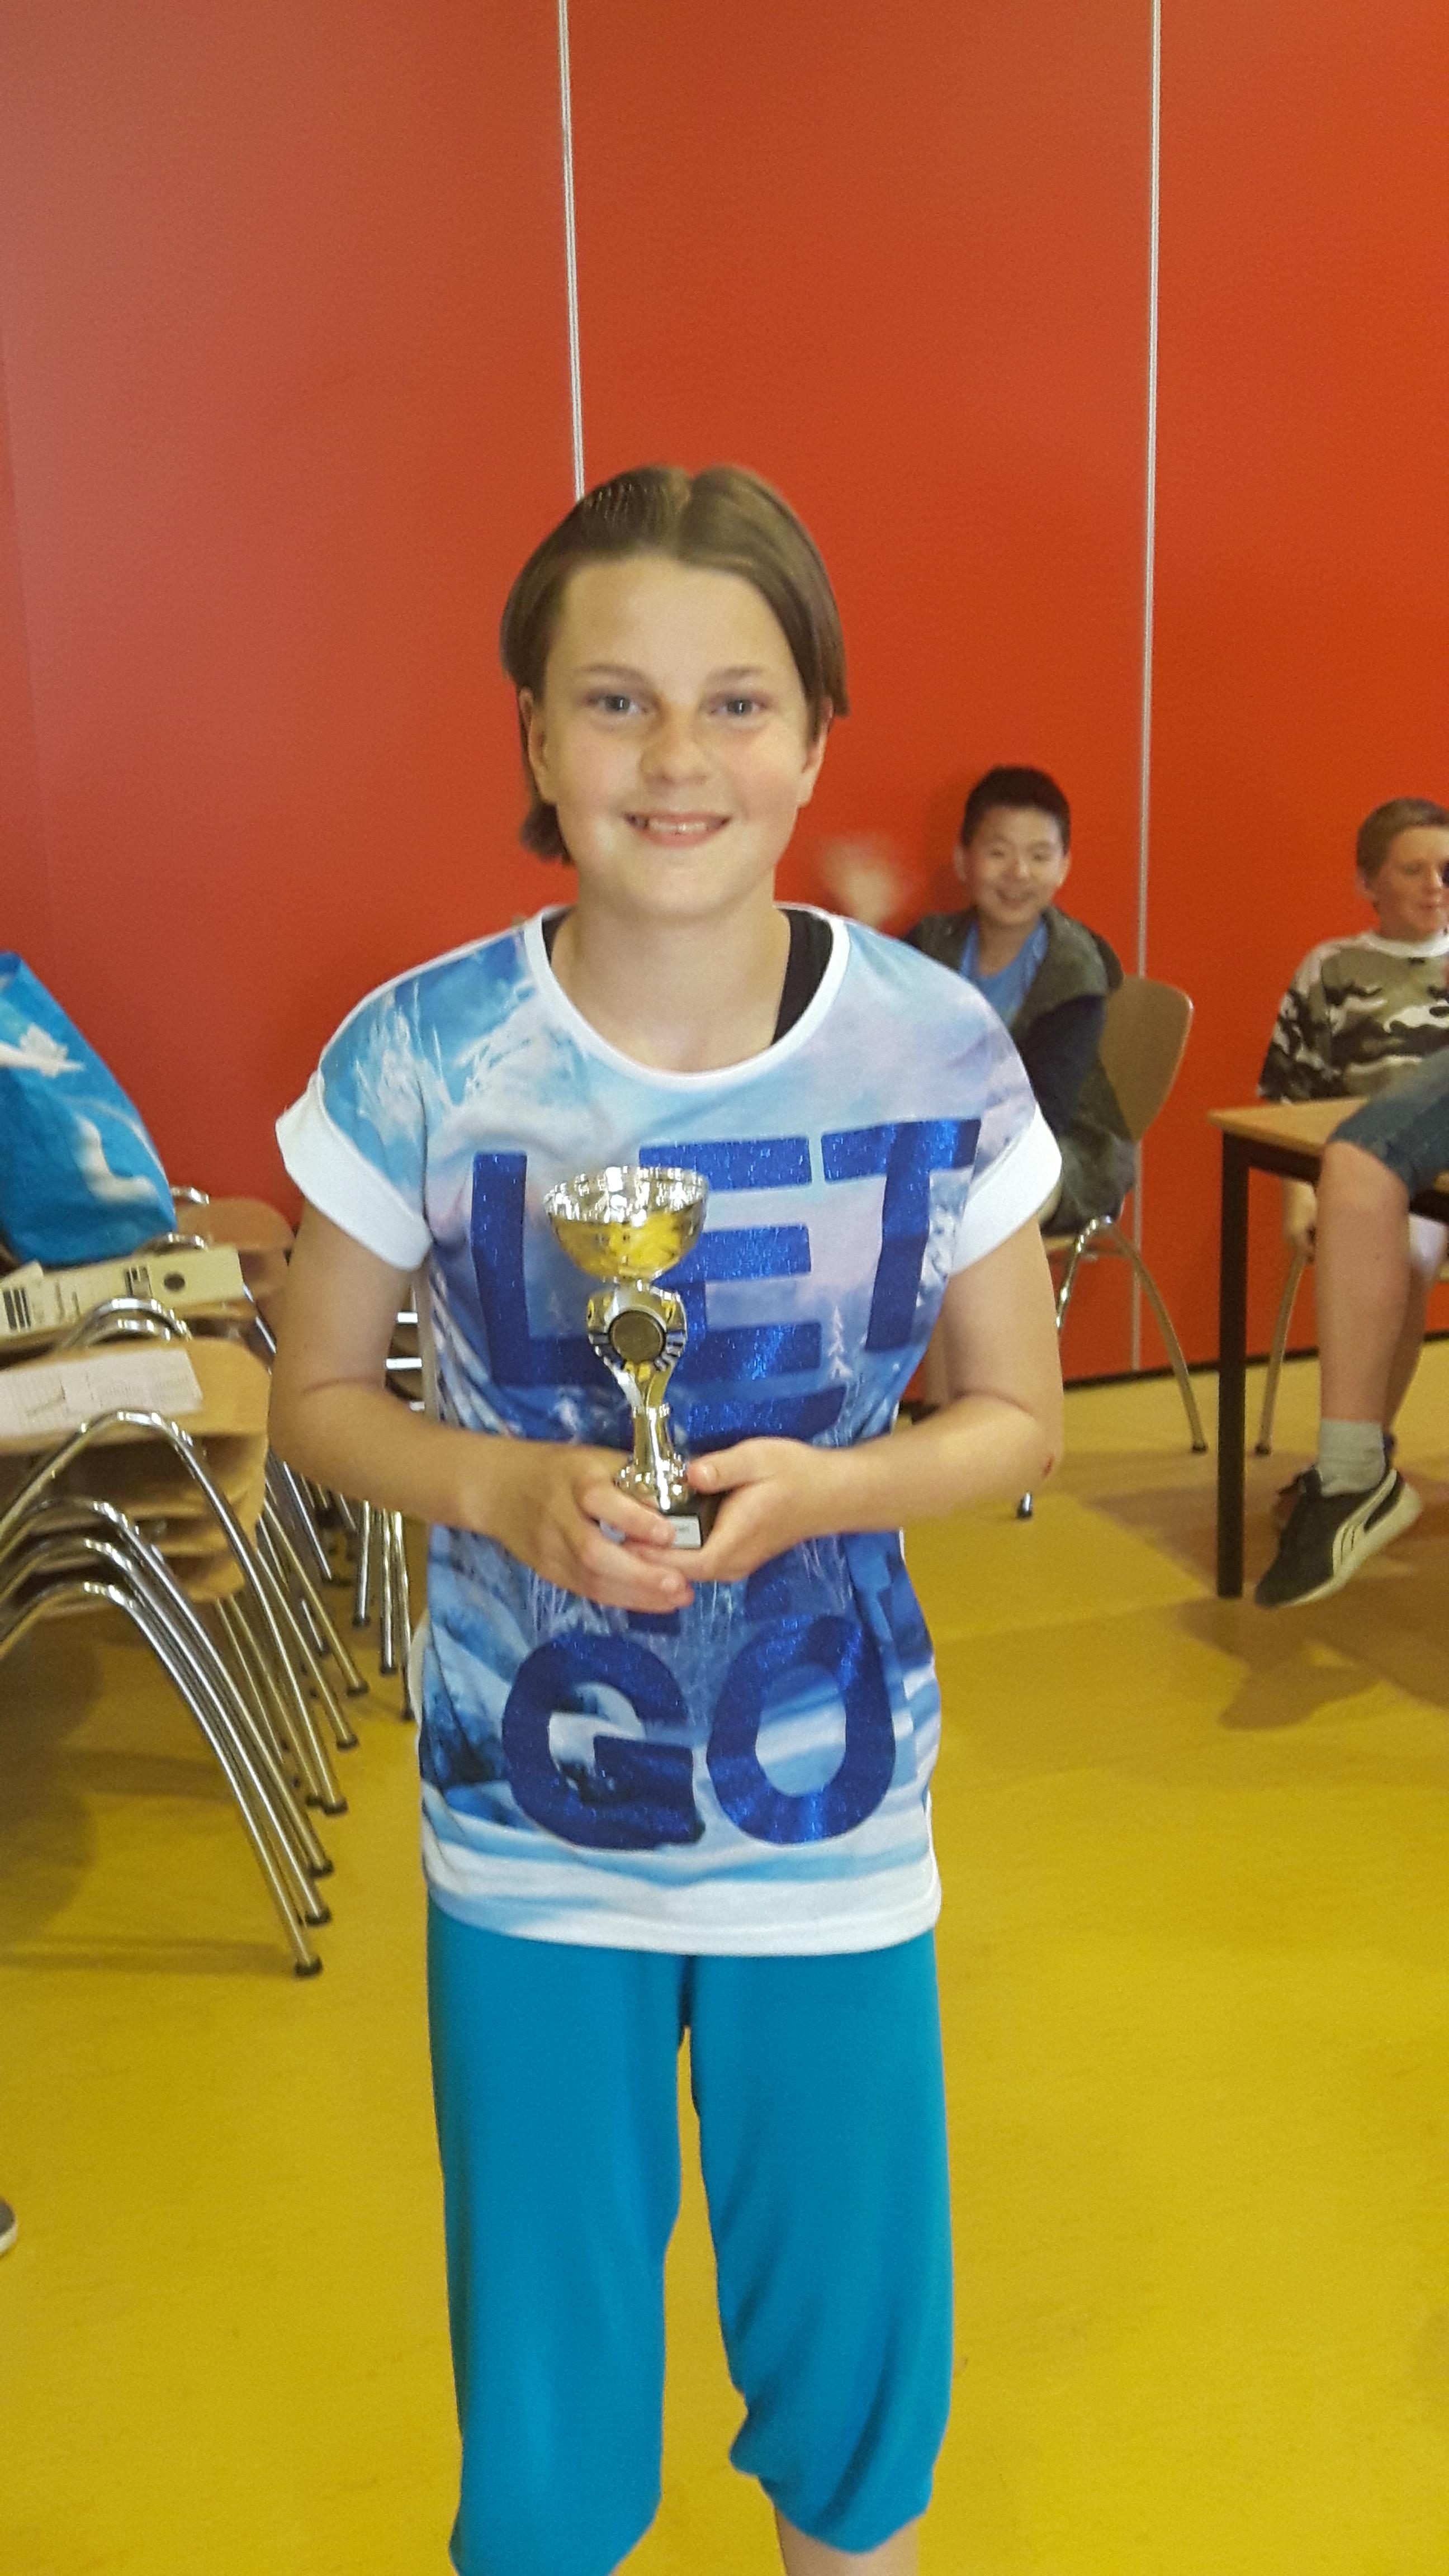 12 jarige Kyra van Driel uit Heiligerlee     3e bij Groningse titel sneldammen